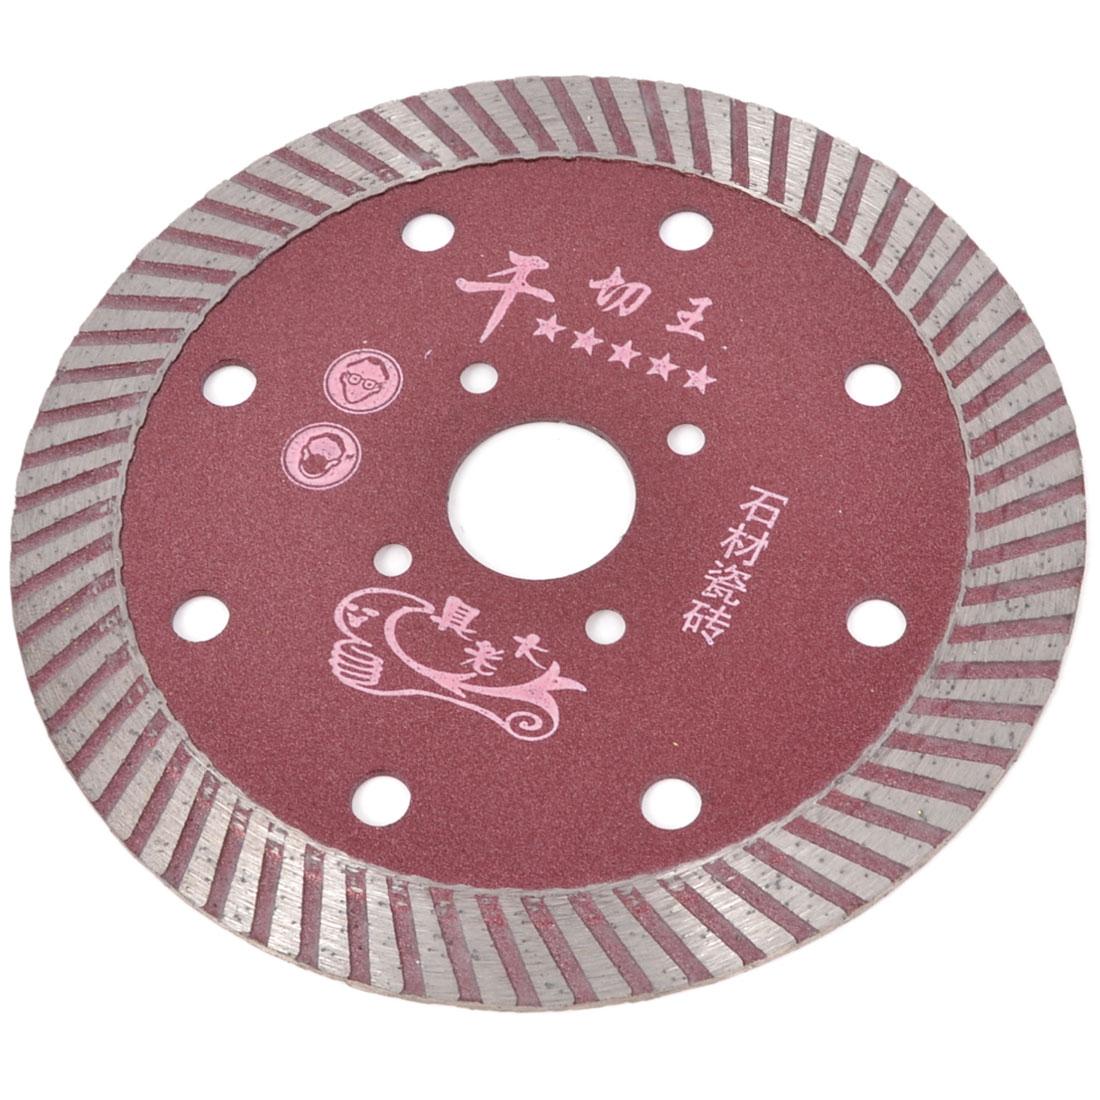 Concrete Cutting Mechine Part Wheel Diamond Saw Cutter 114mm x 20mm x1.8mm